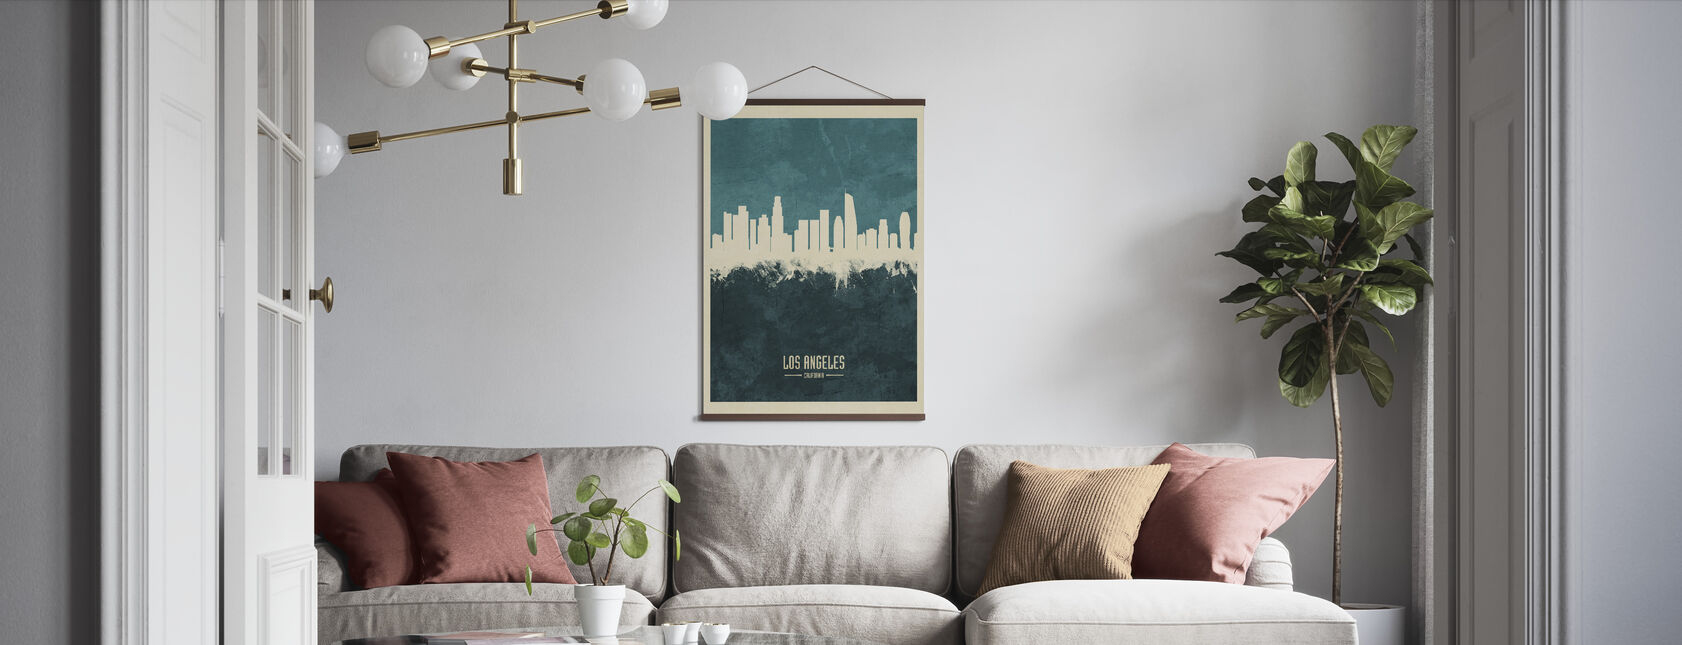 Los Angeles California Skyline Blauw - Poster - Woonkamer